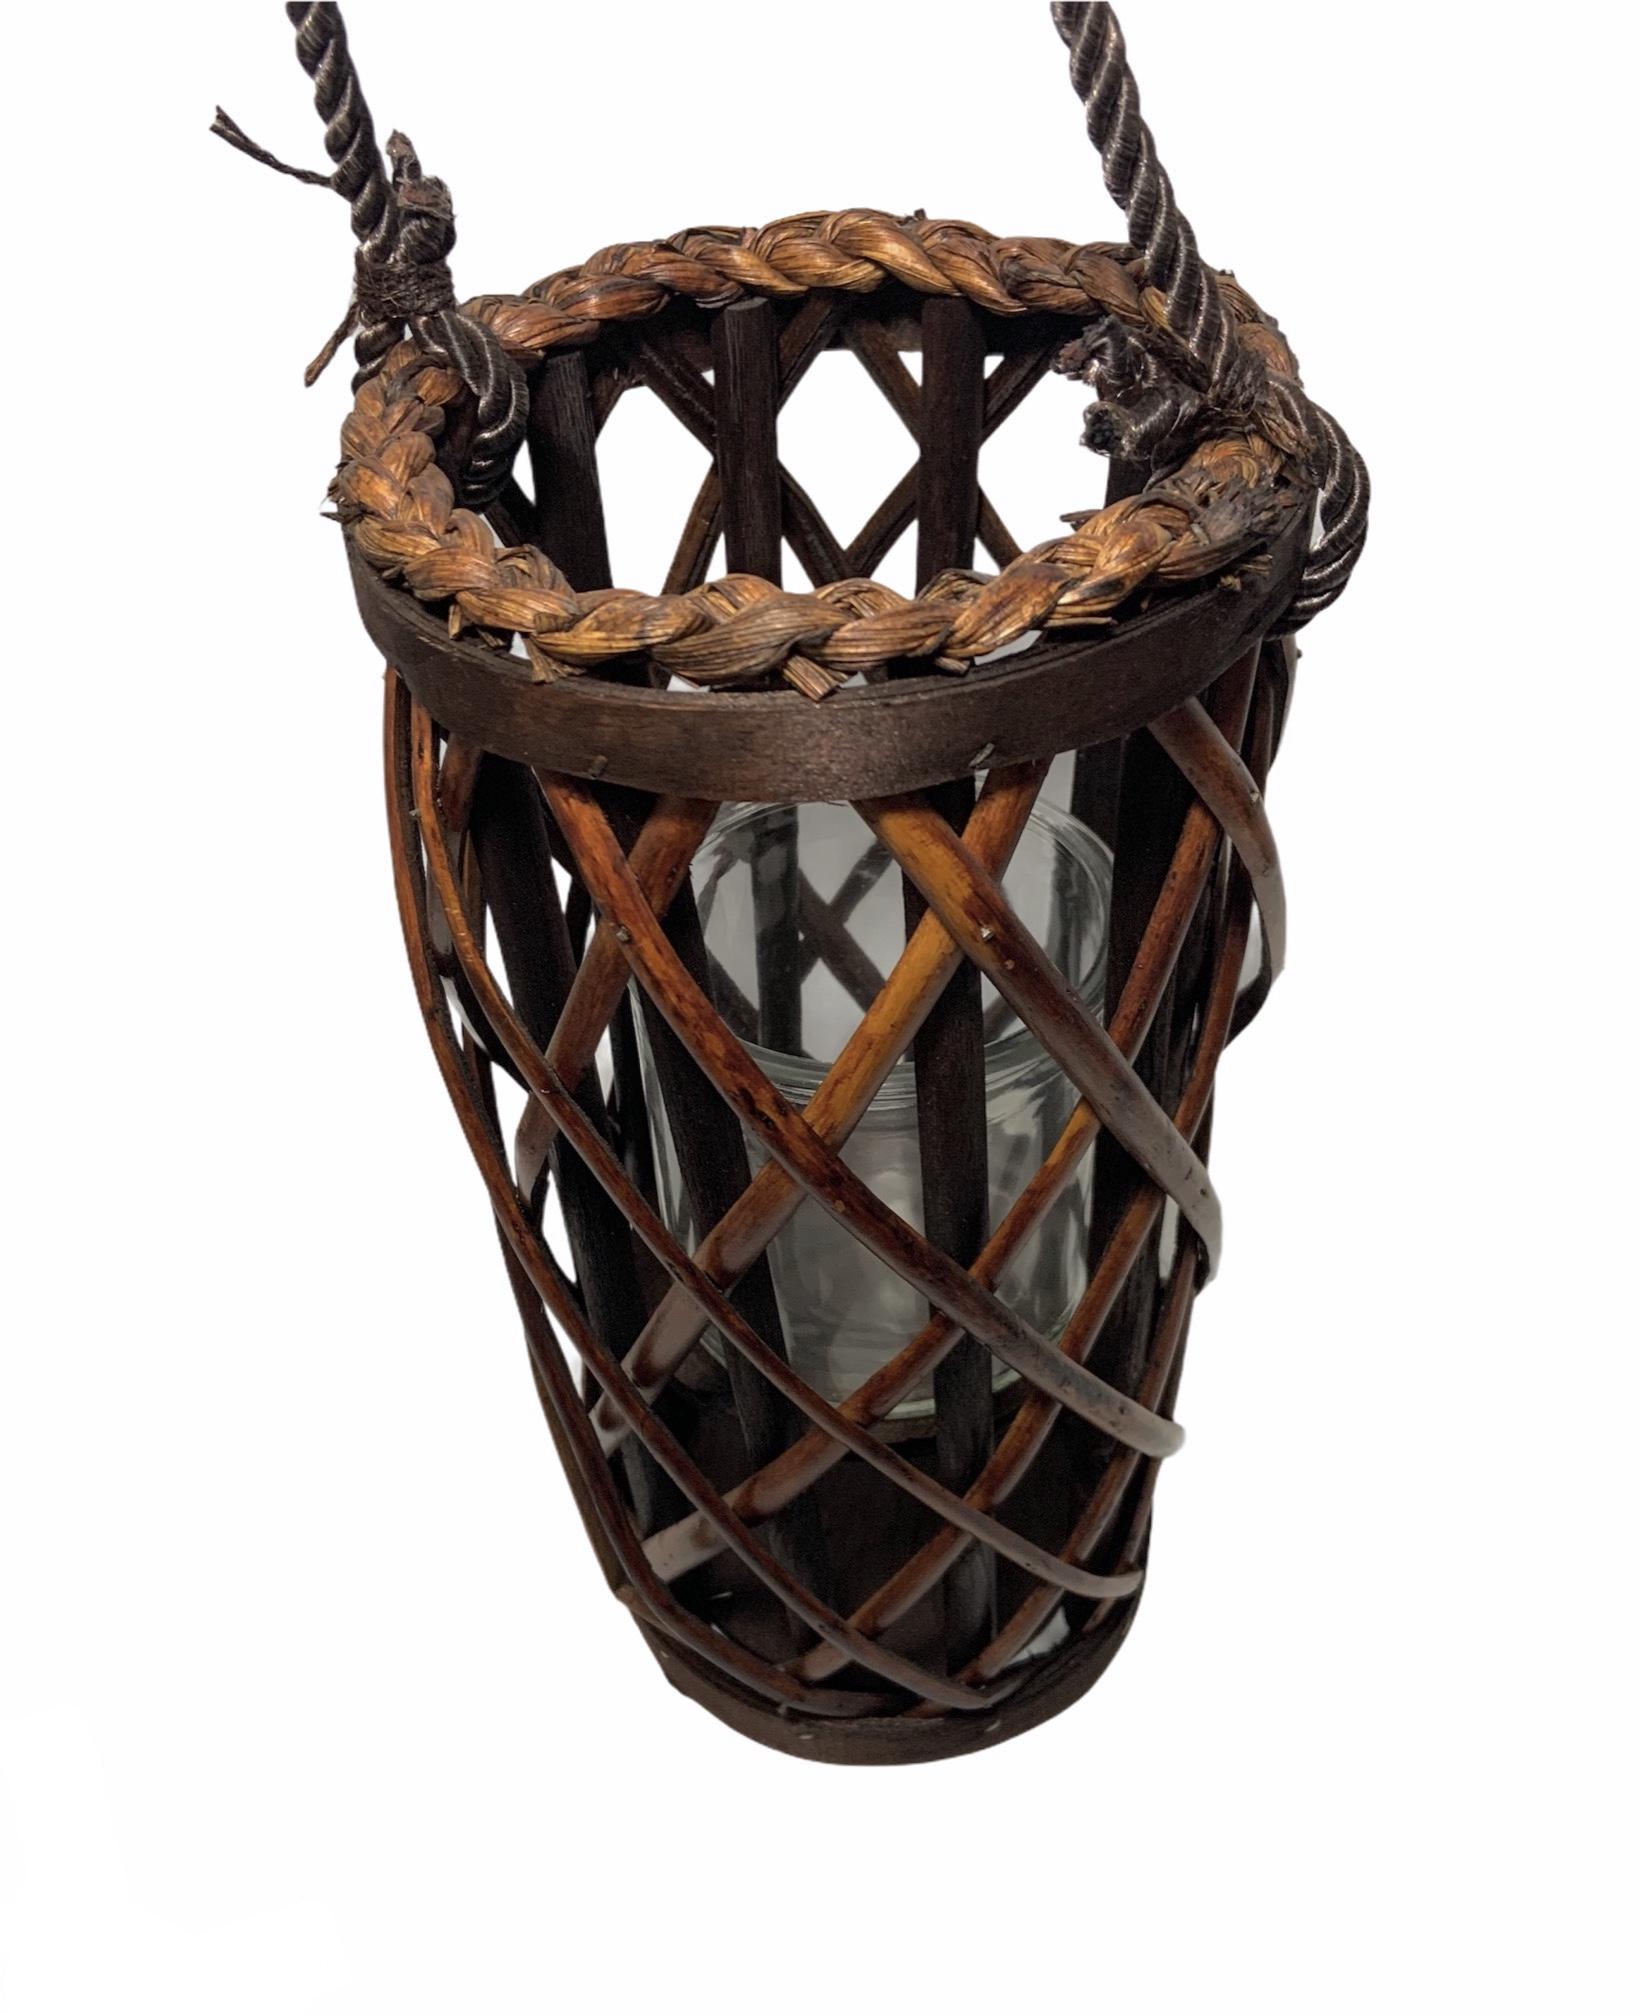 31570-farol-madera-cuerda-31-cm-1.jpeg